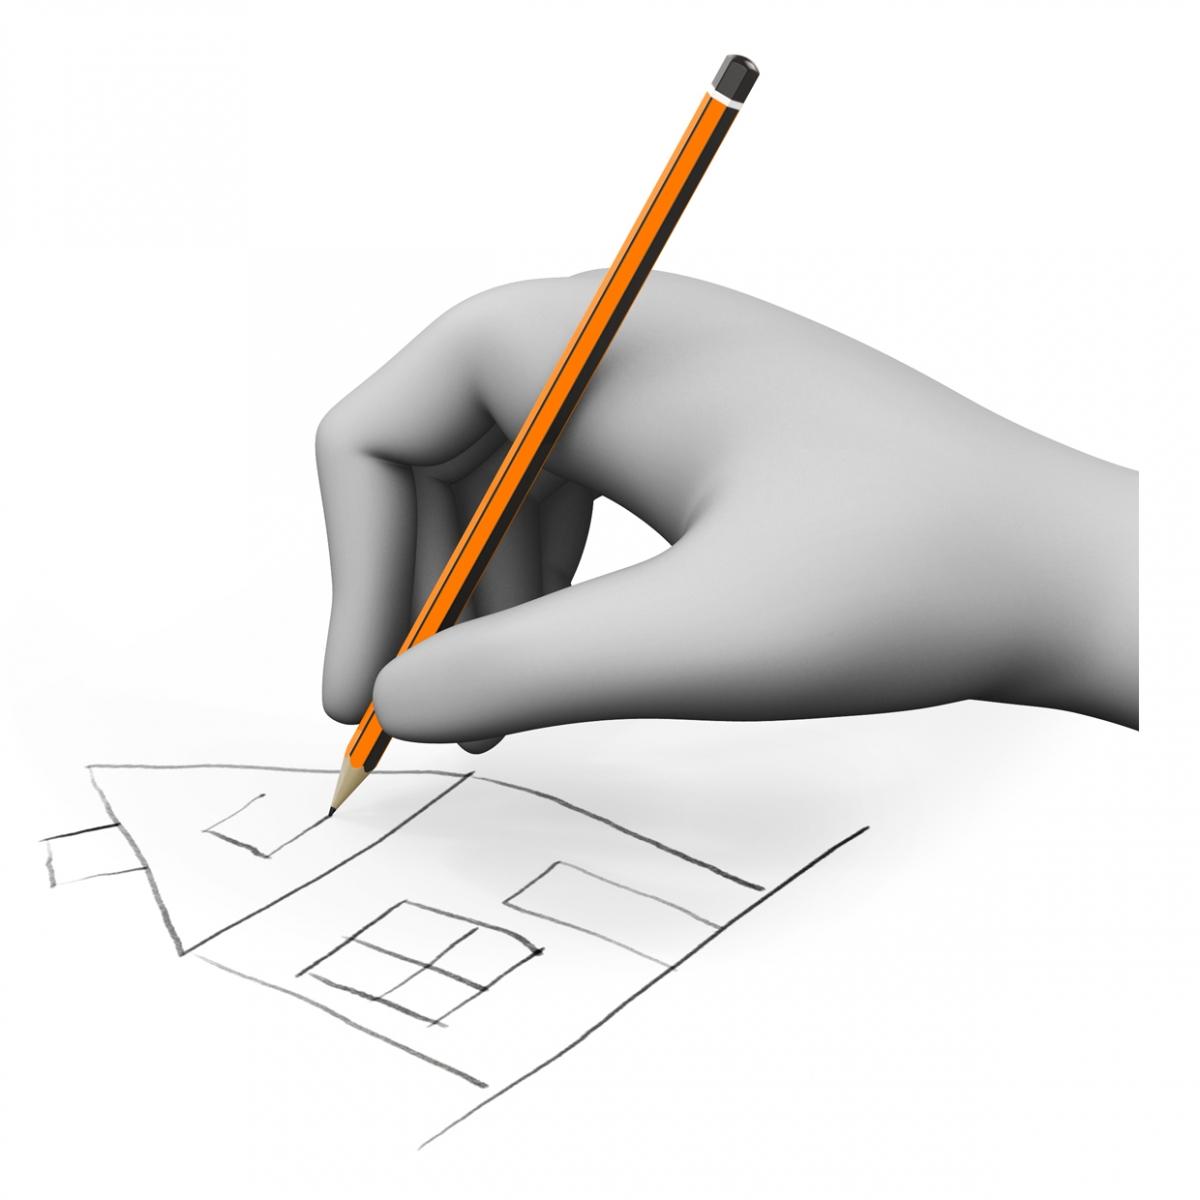 Imagen del verbo dibujar